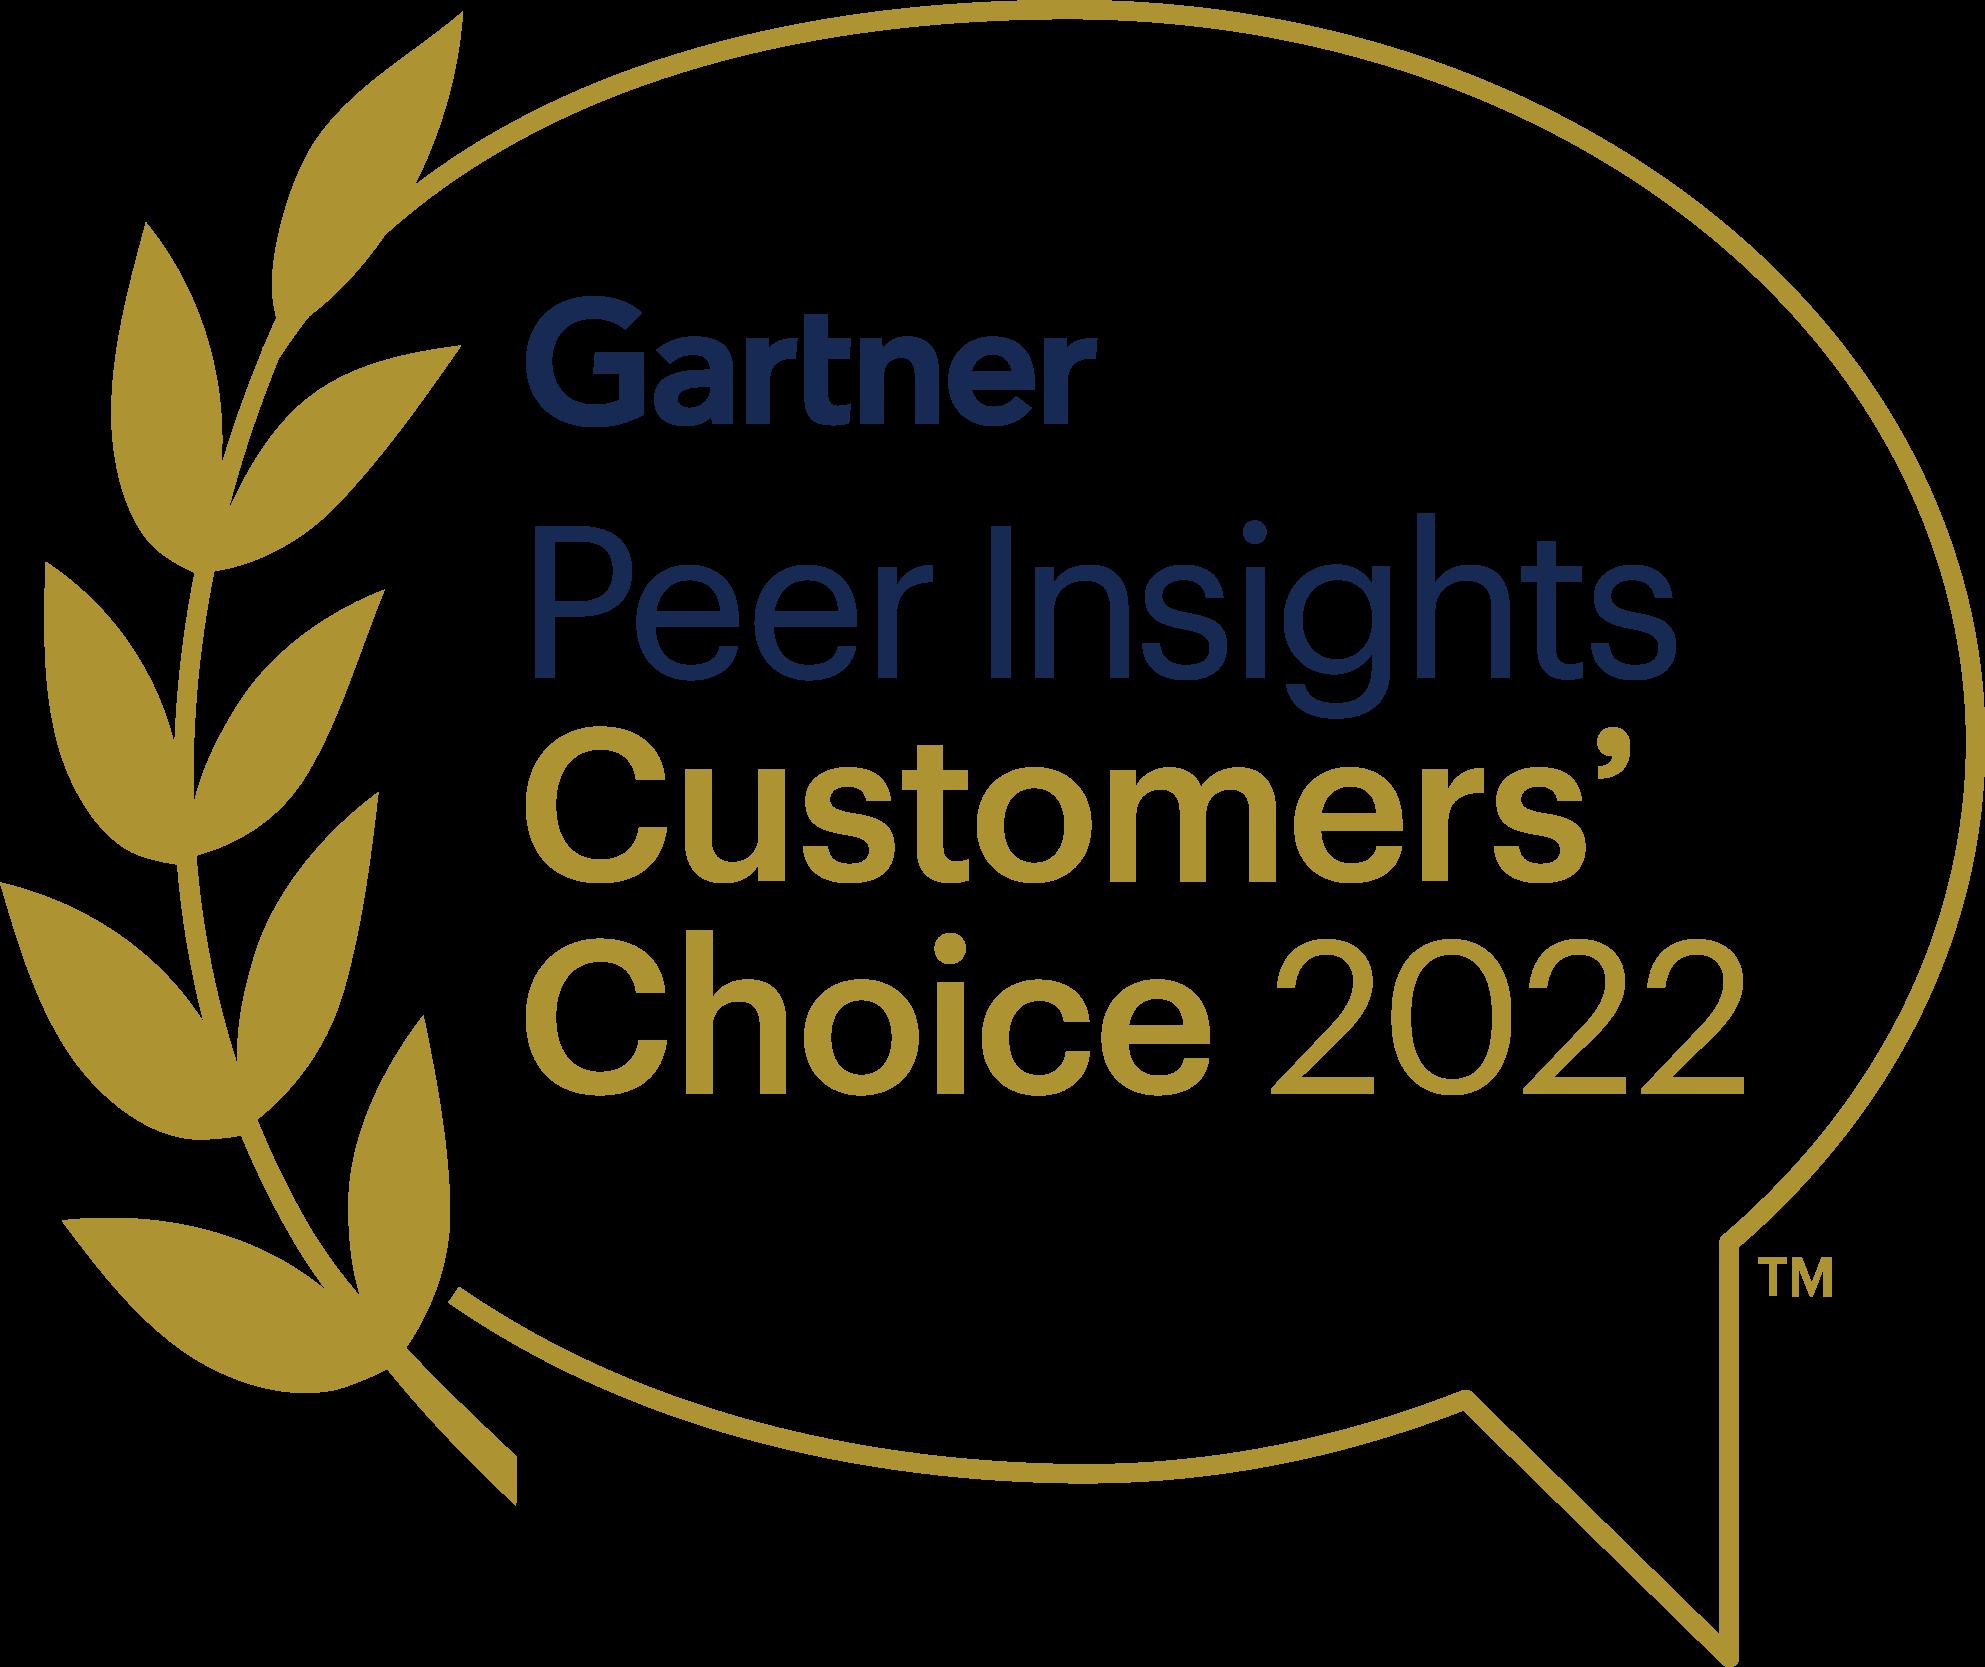 gartner customers choice